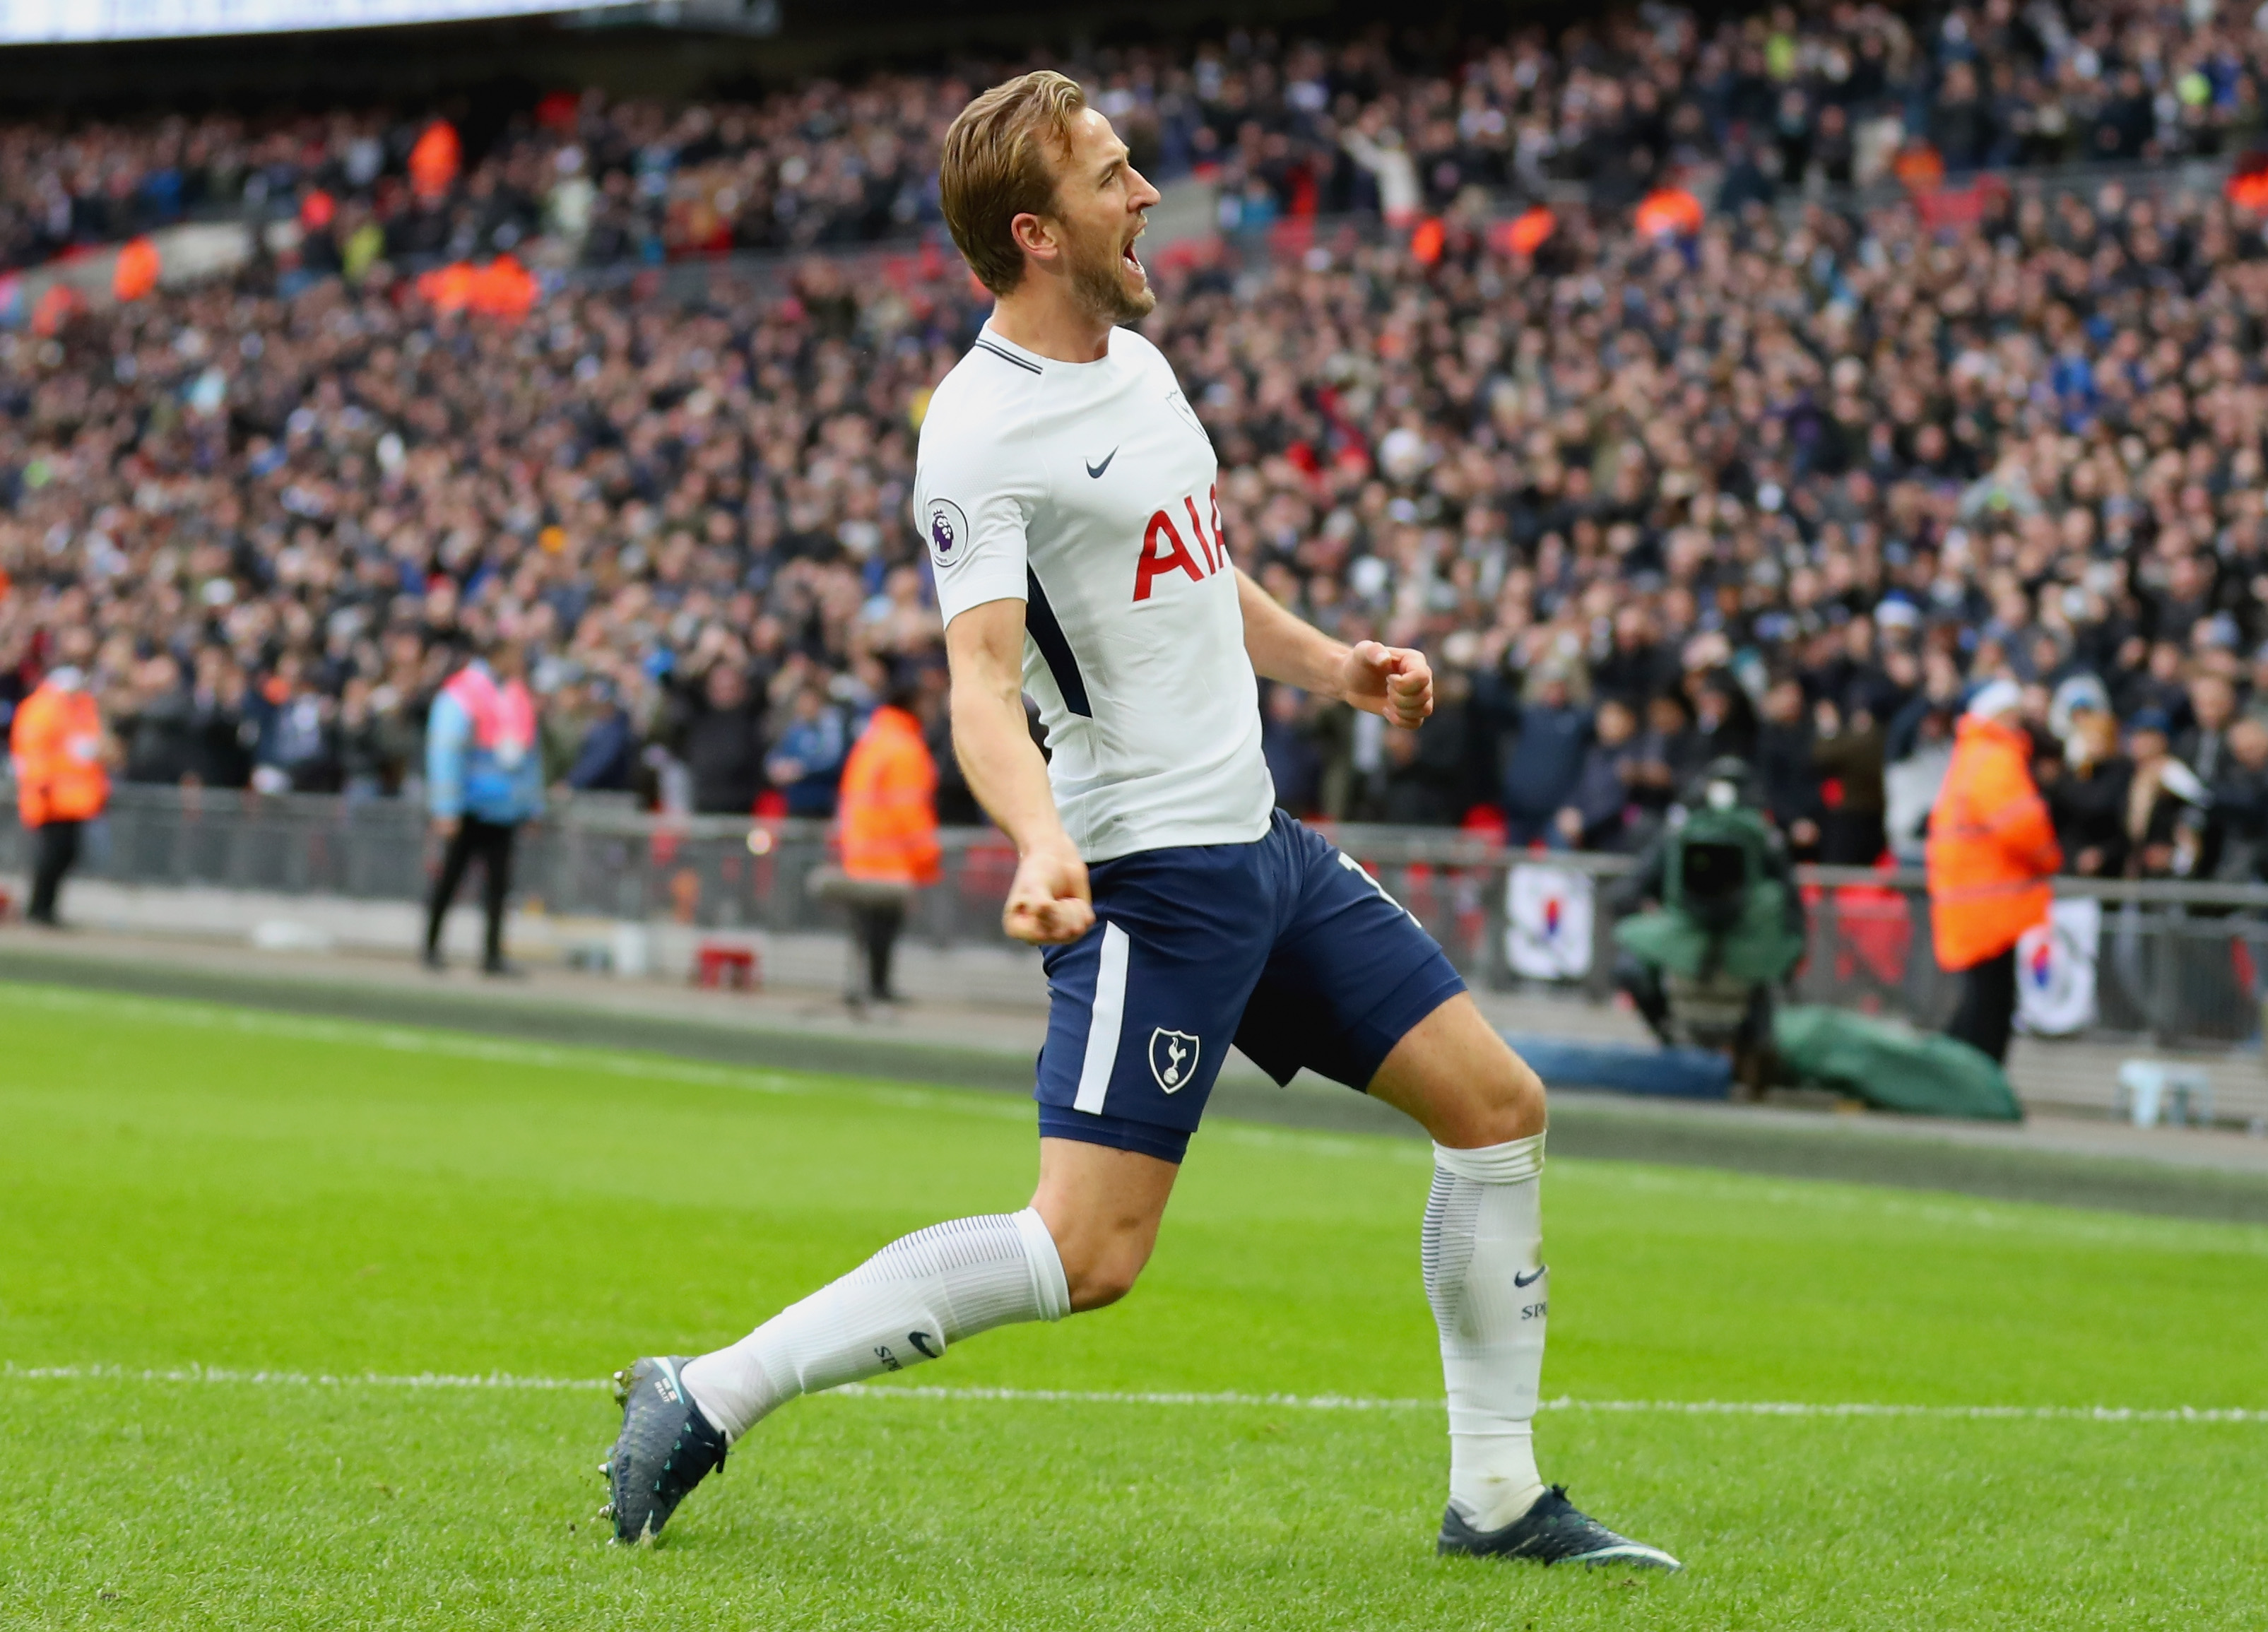 Tottenham's history boy Harry Kane is hailed as world's top striker